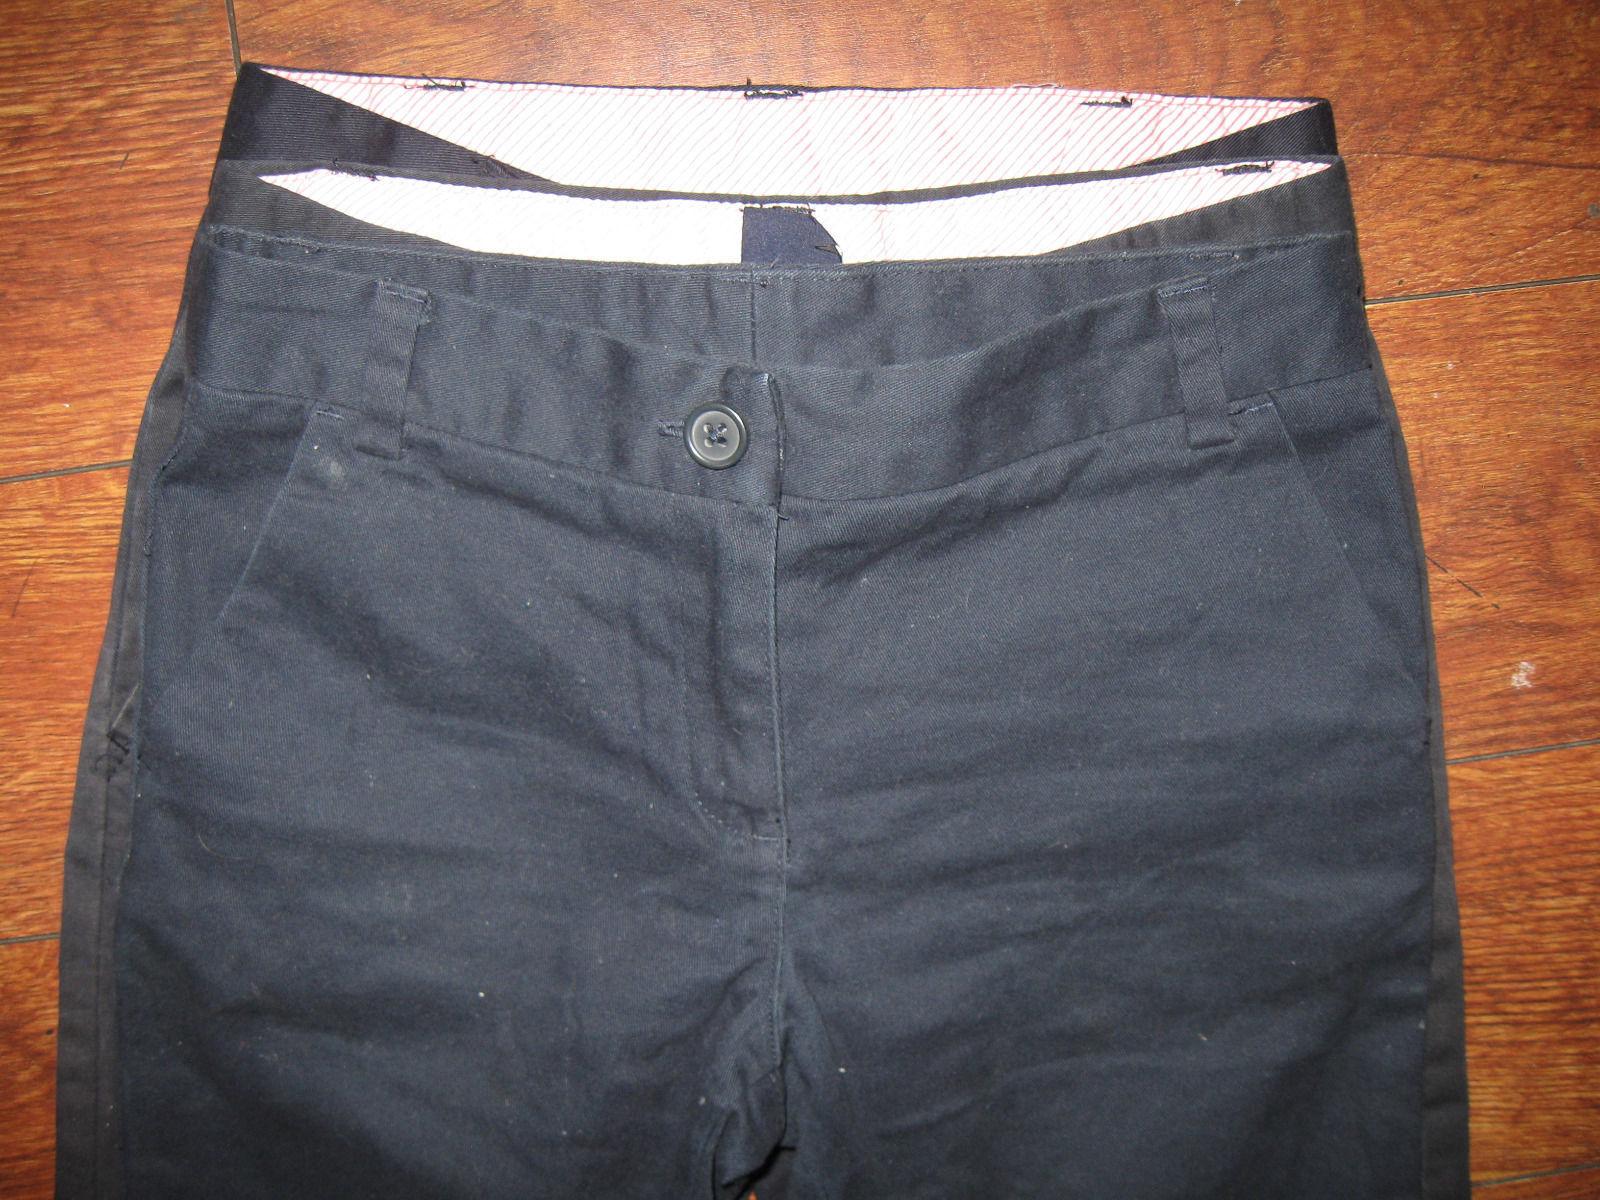 Gap NWT Boys Navy Black Relaxed Khakis in Stretch School Uniform Pants 5 6 12 14